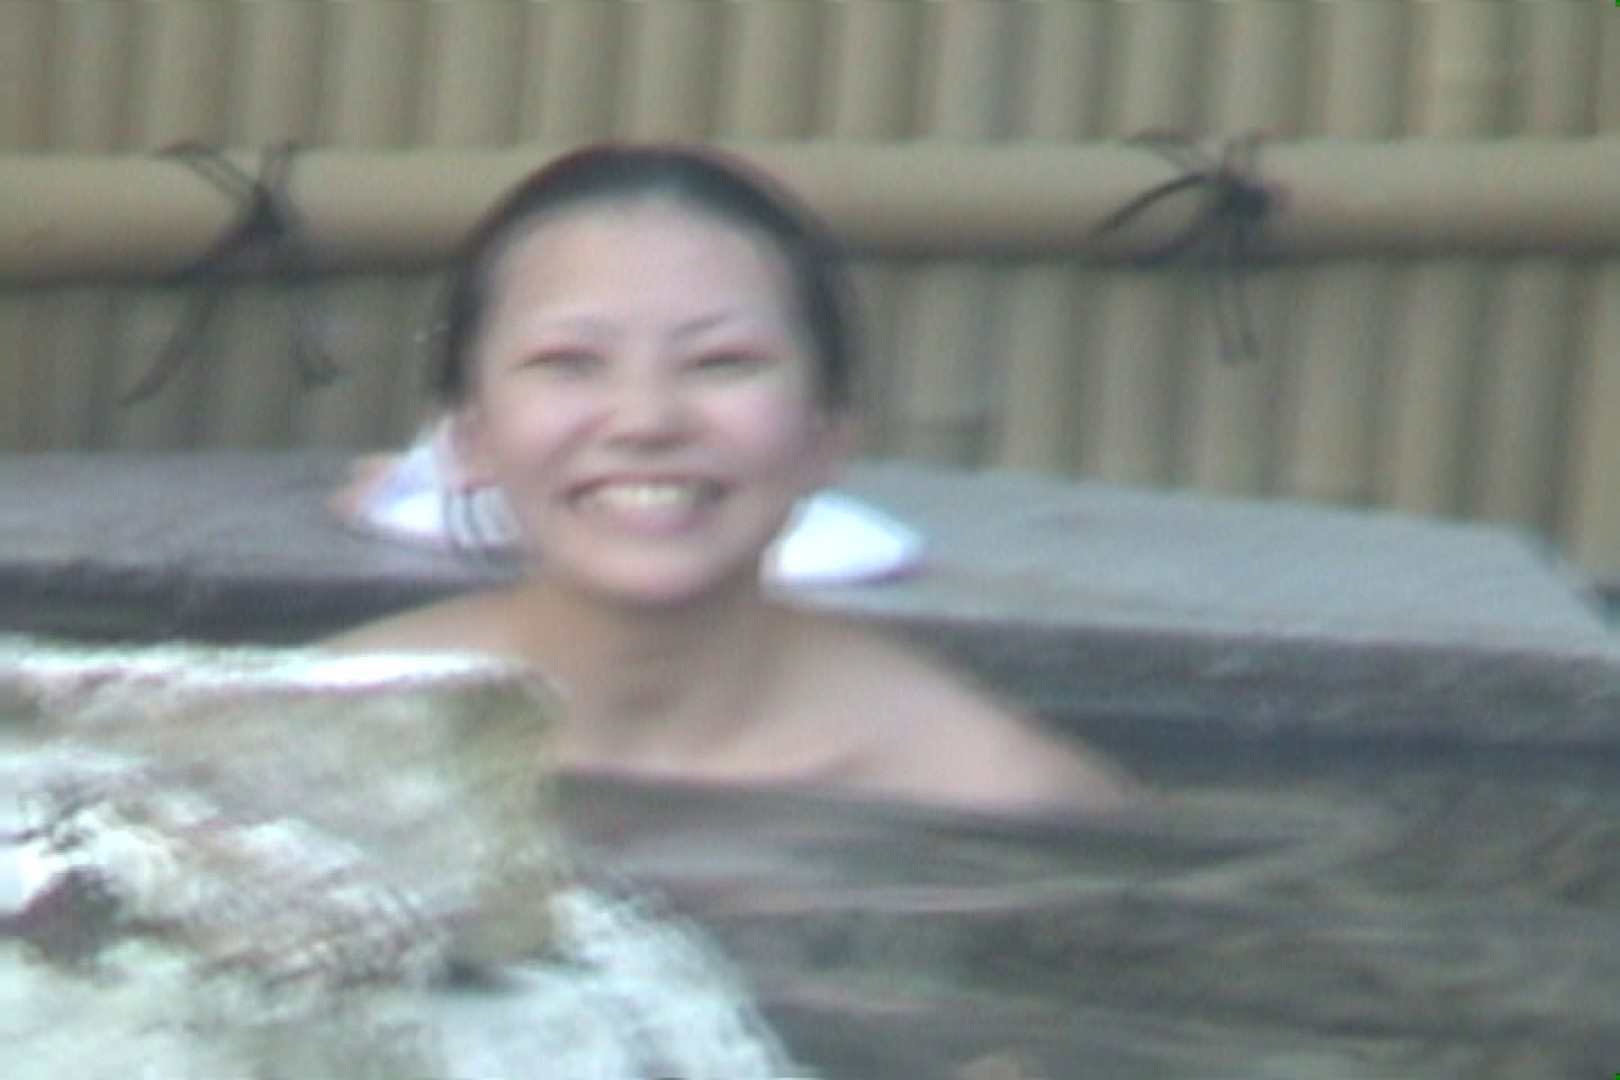 Aquaな露天風呂Vol.572 盗撮 セックス無修正動画無料 52連発 17